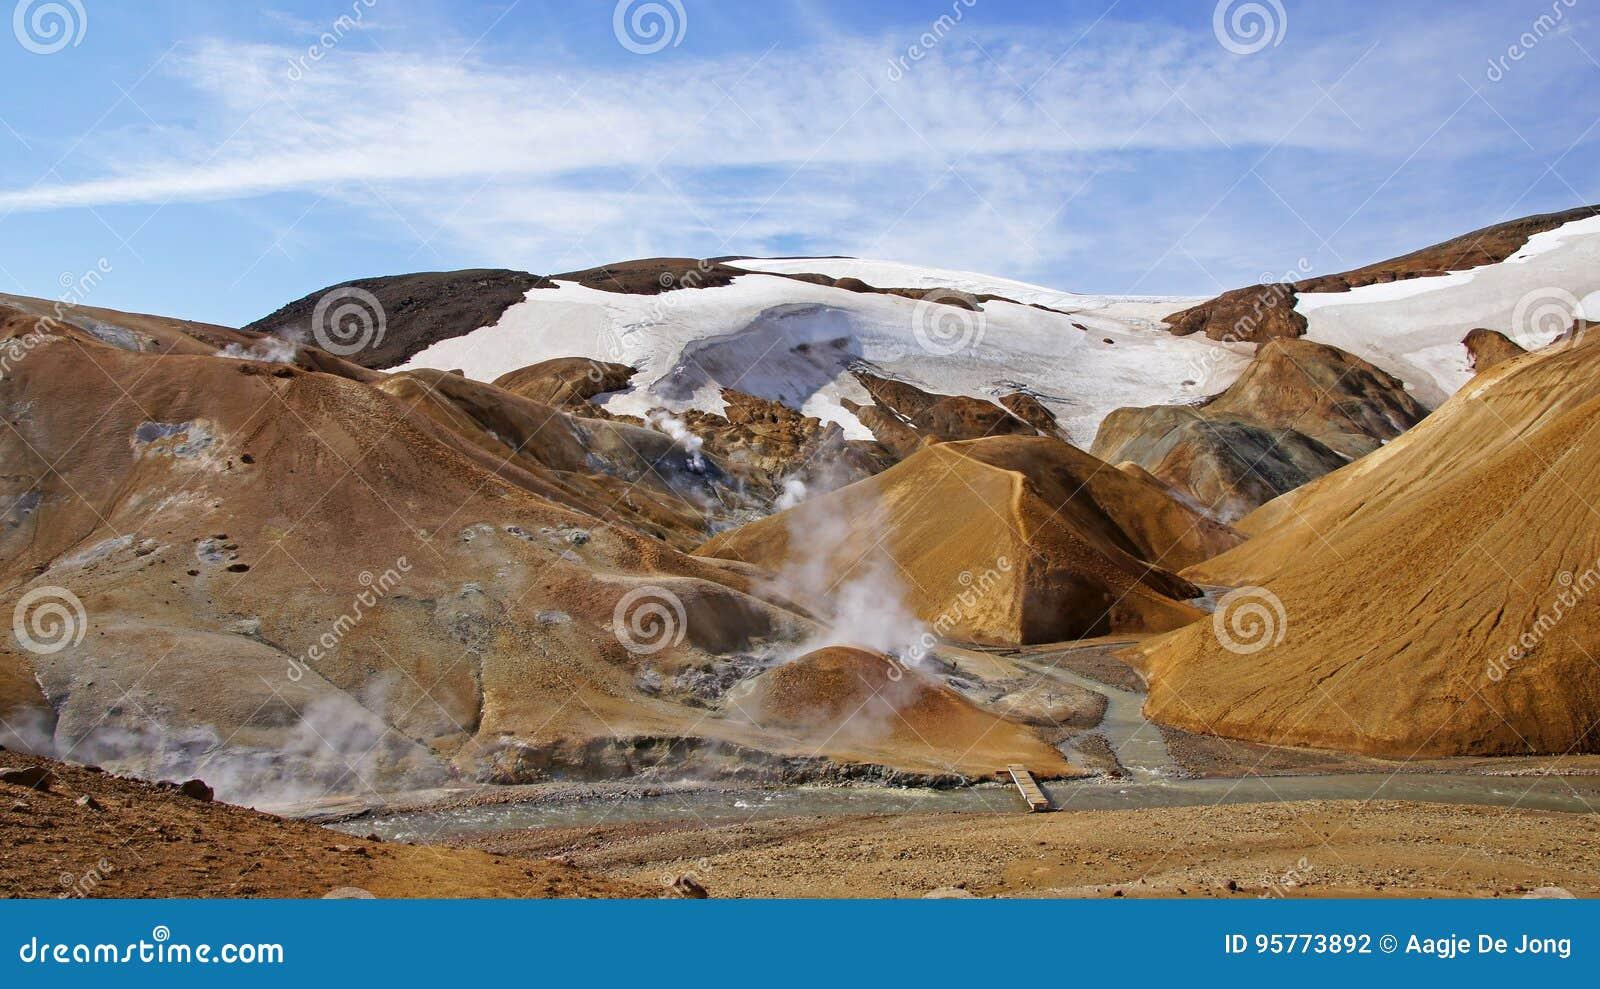 Kerlingarfjoll rhyoliet mountain in centre of Iceland